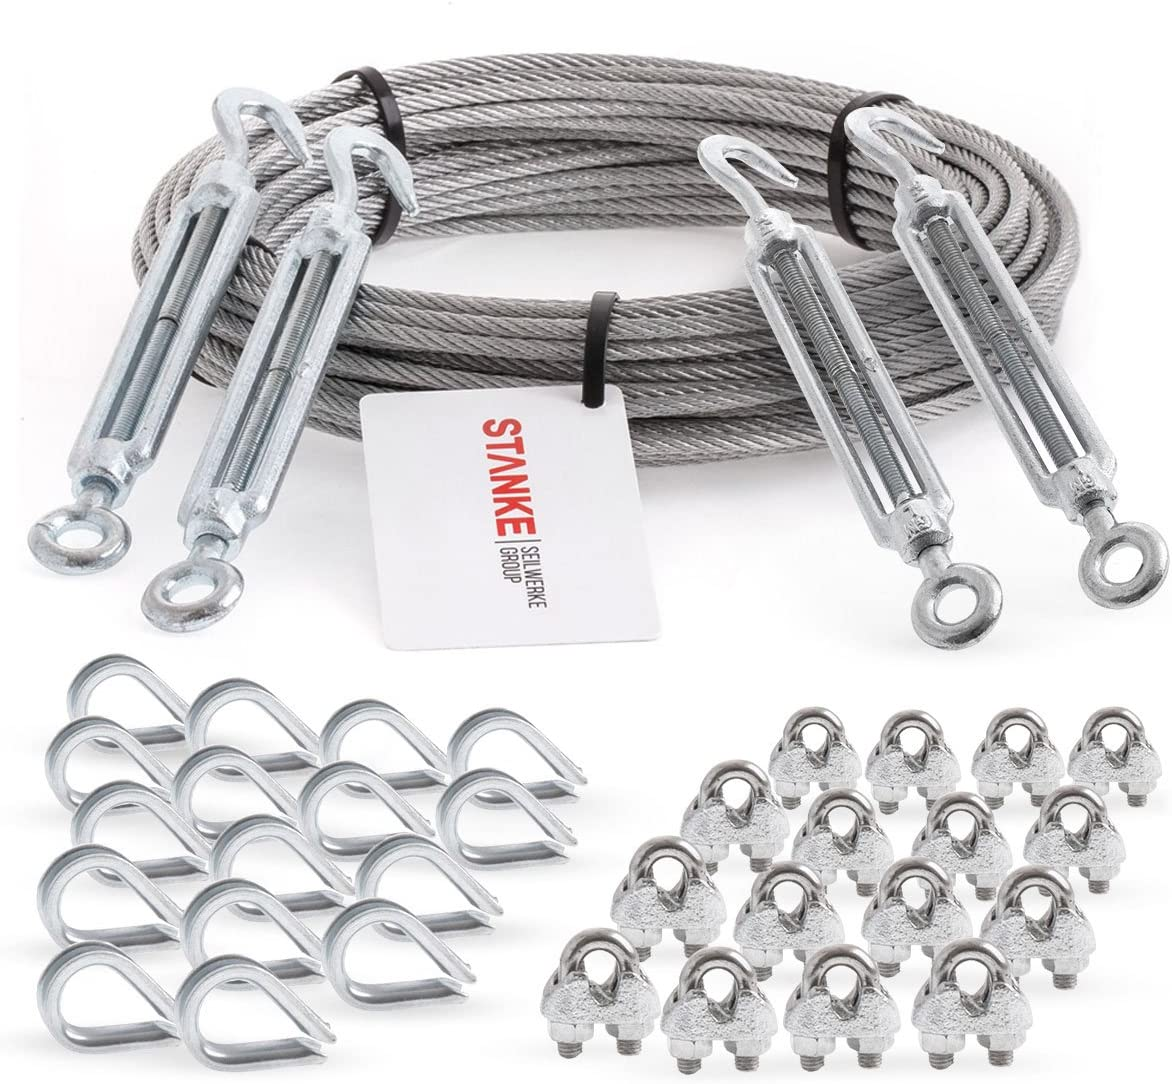 Seilwerk STANKE 10x M14 x 140mm Spannschloss /Öse-/Öse Spannschl/össer VERZINKT Seilspanner Spannschraube Spanner f/ür Drahtseil Haken /Öse Stahlseil Seil DIN Gewinde